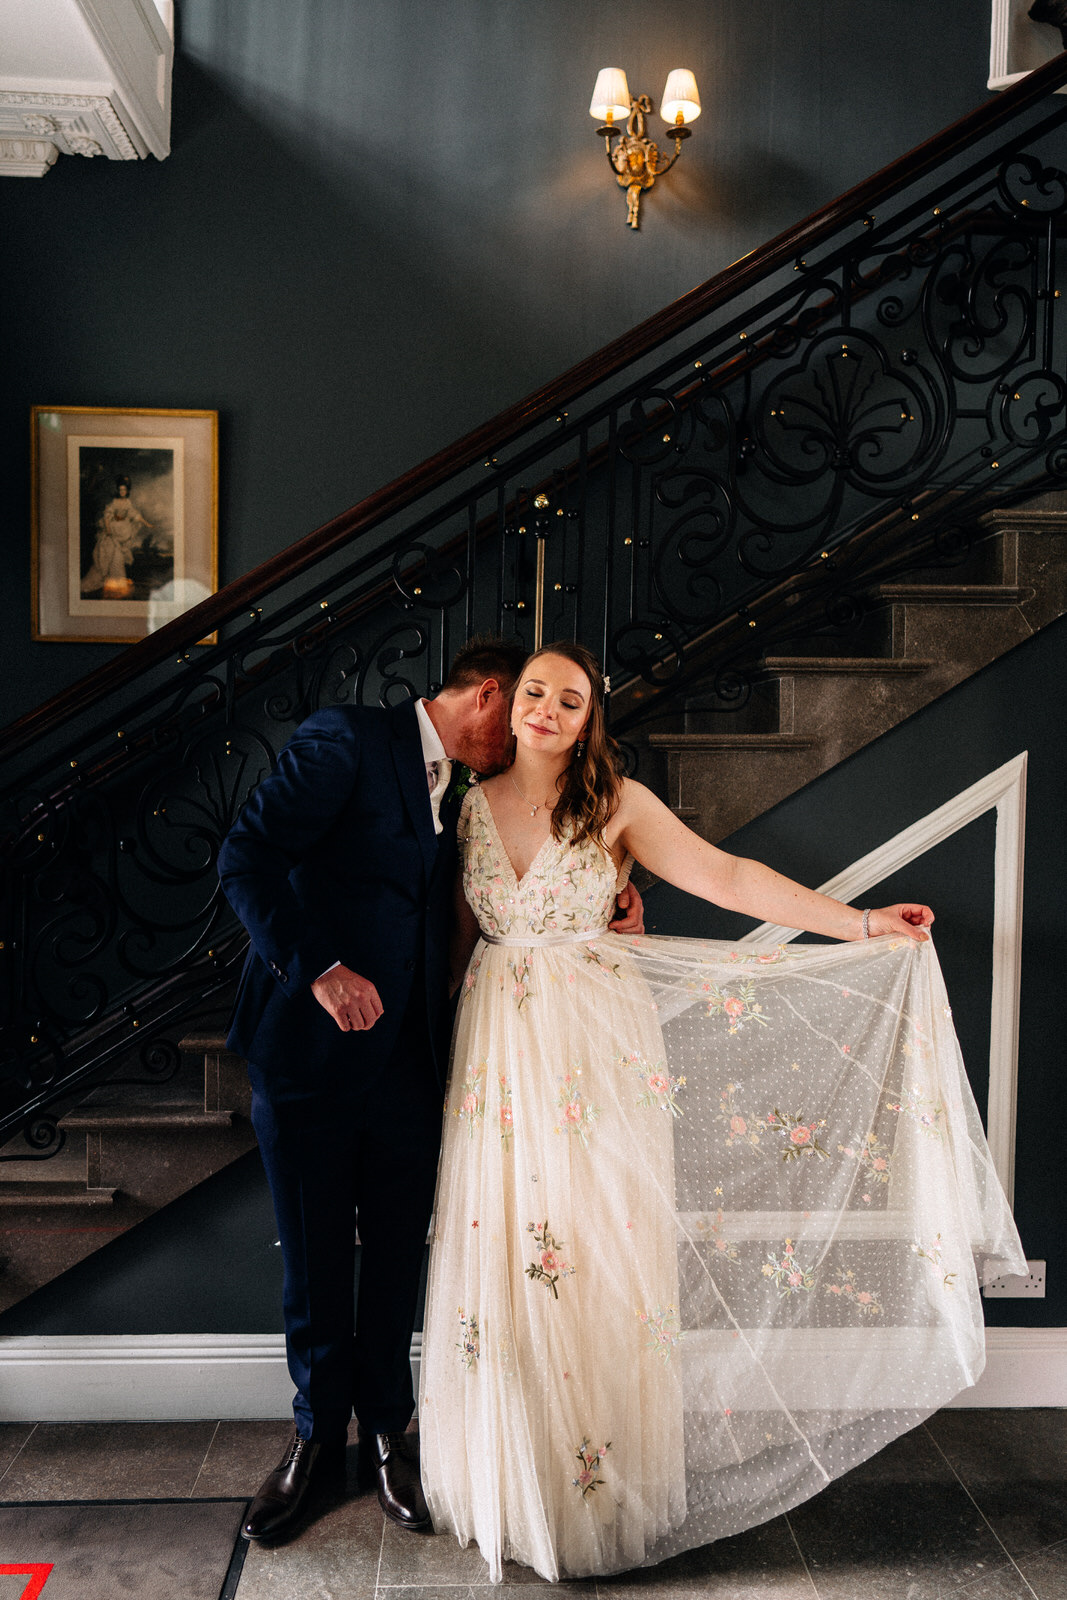 wedding photographer dublin 1,025 200